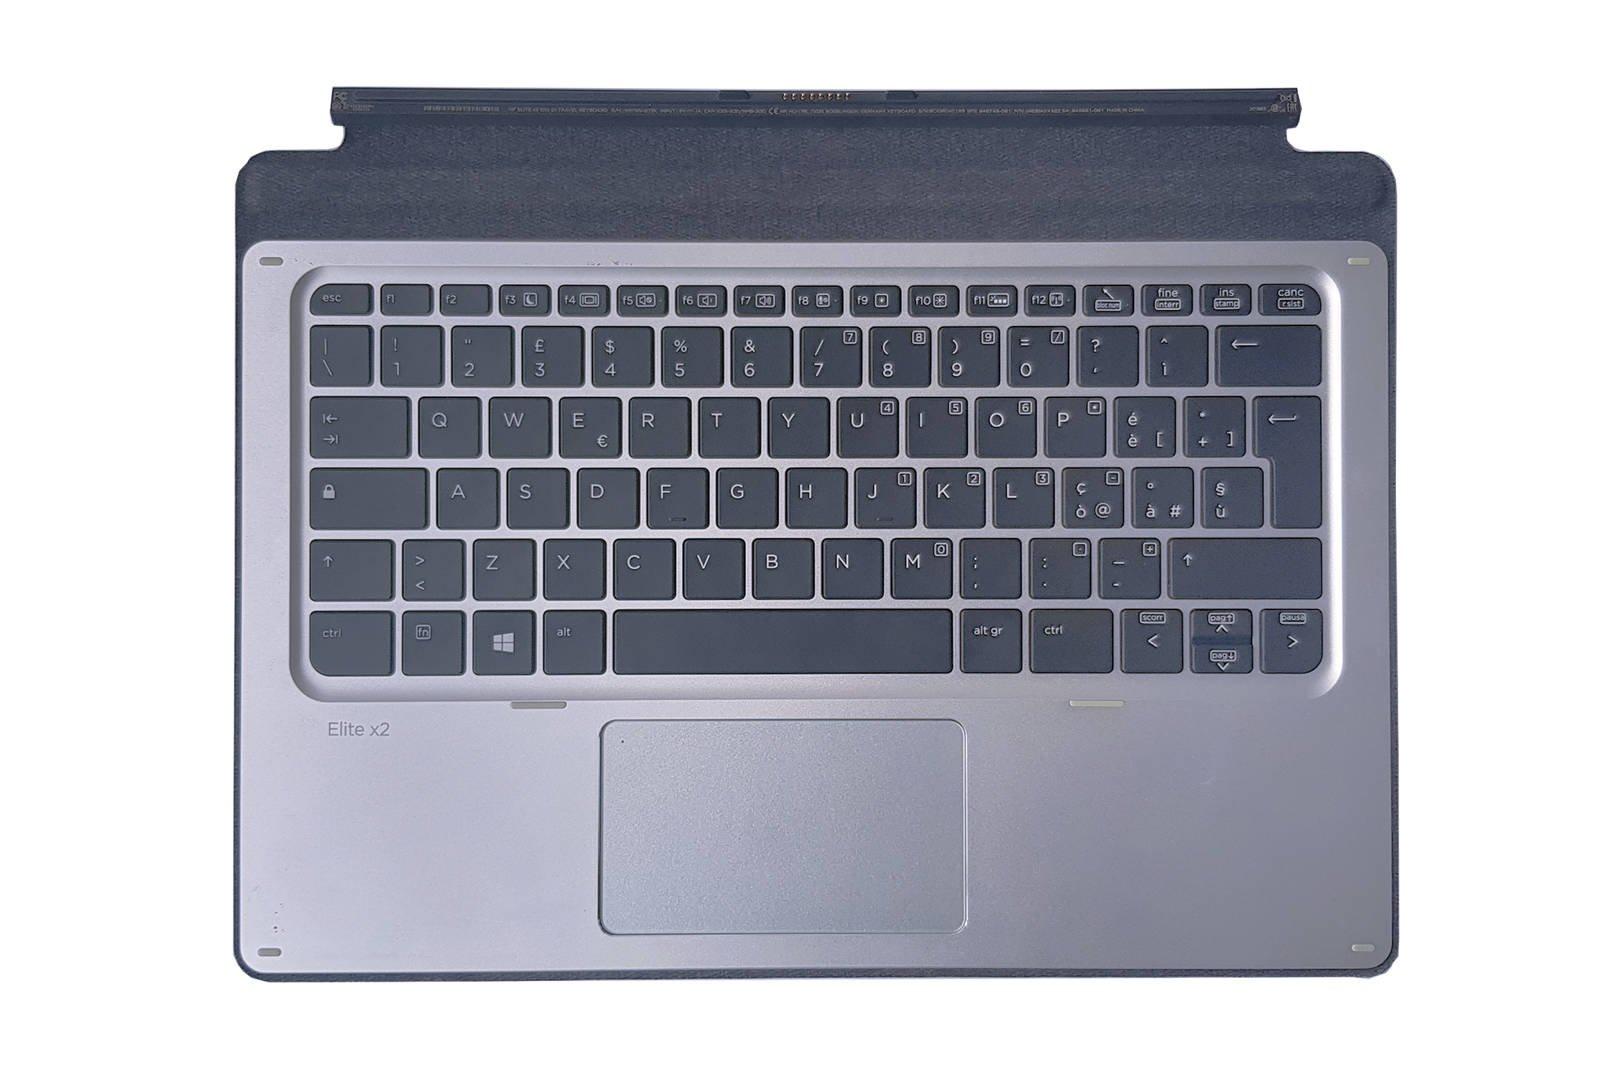 HP Elite x2 1012 G1 Travel Keyboard HSTNN-D72K Italy